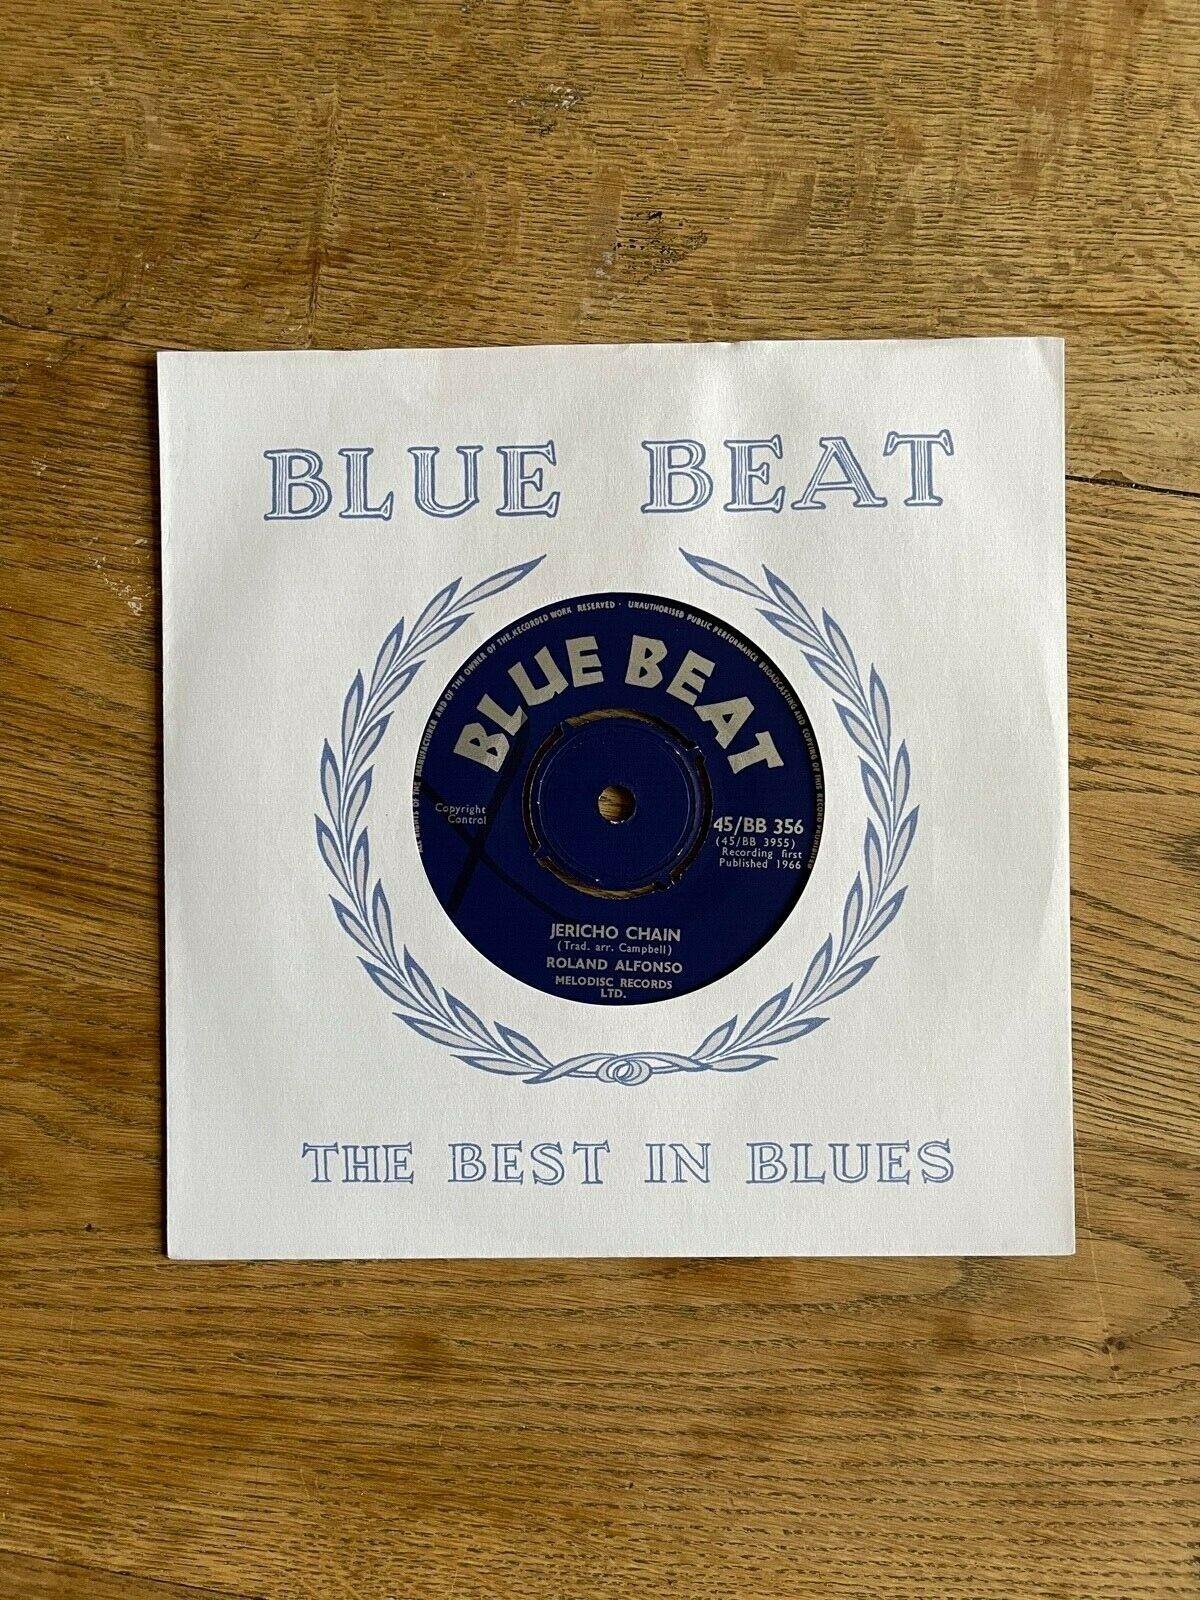 Ska - Roland Alfonso (Alphonso) - Jericho Chain - Blue Beat 45/BB356 Near Mint